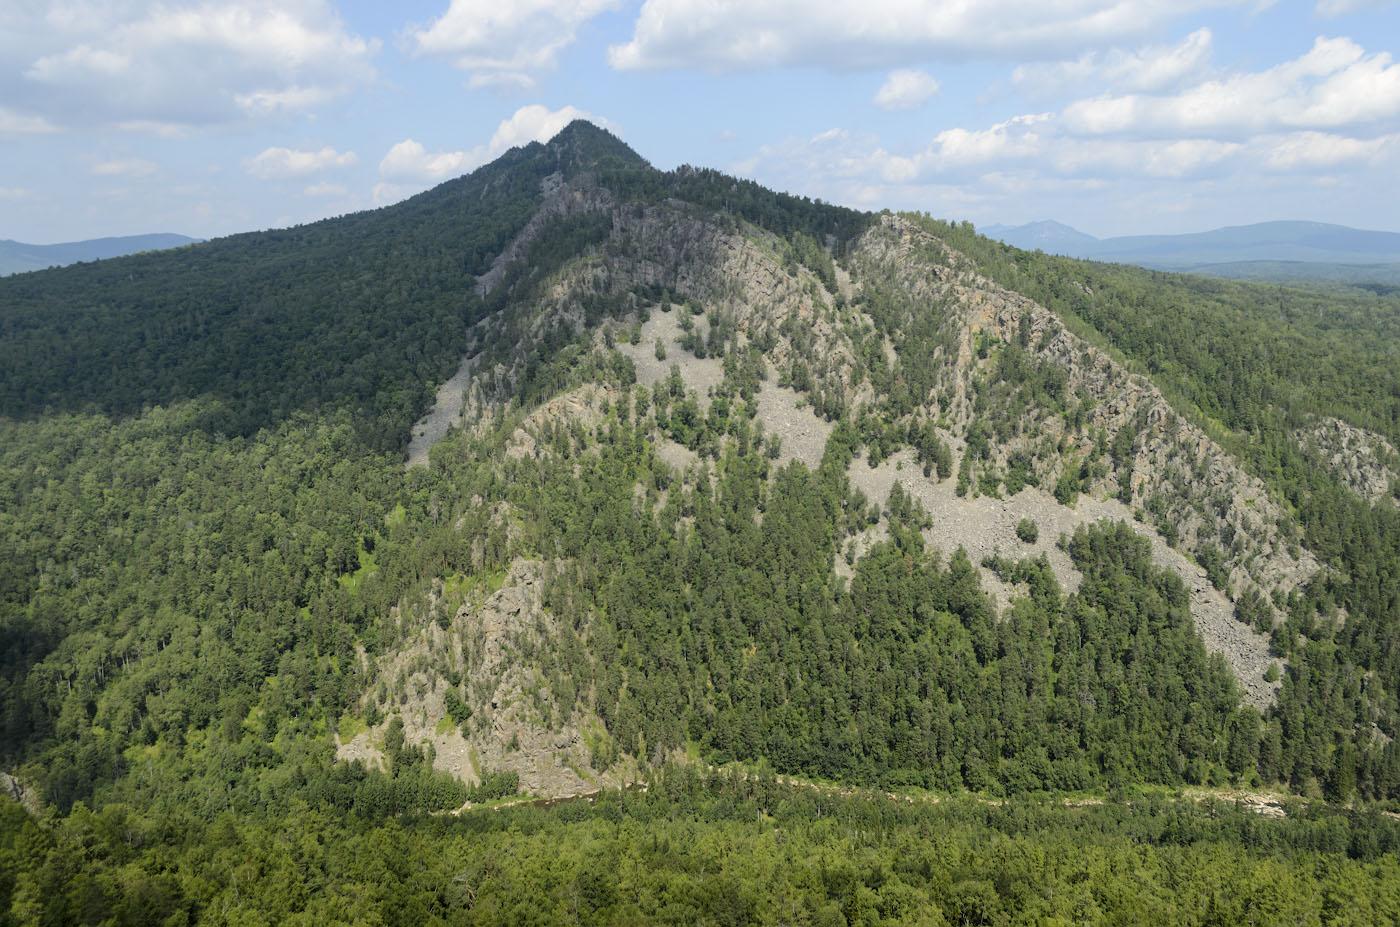 Фото 9. Тот же пейзаж, но без полярика. Гора Малый Ямантау в Башкирии. Настройки, использованные при съемке: 1/320, f/6.3, 100, 18.